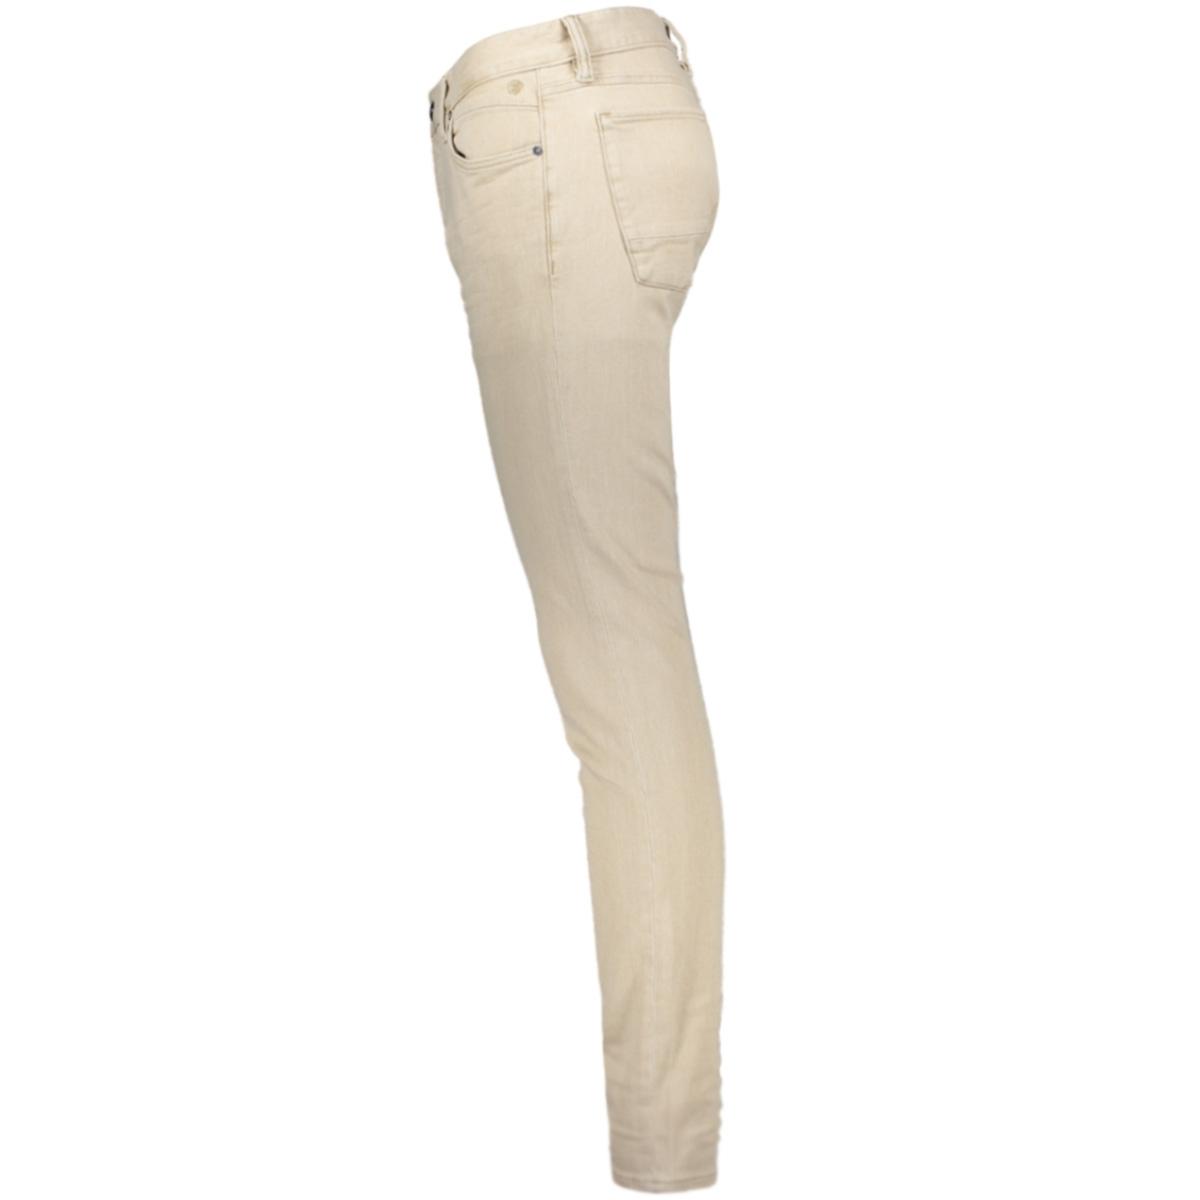 riser comfort colored denim ctr201217 cod cast iron jeans cod